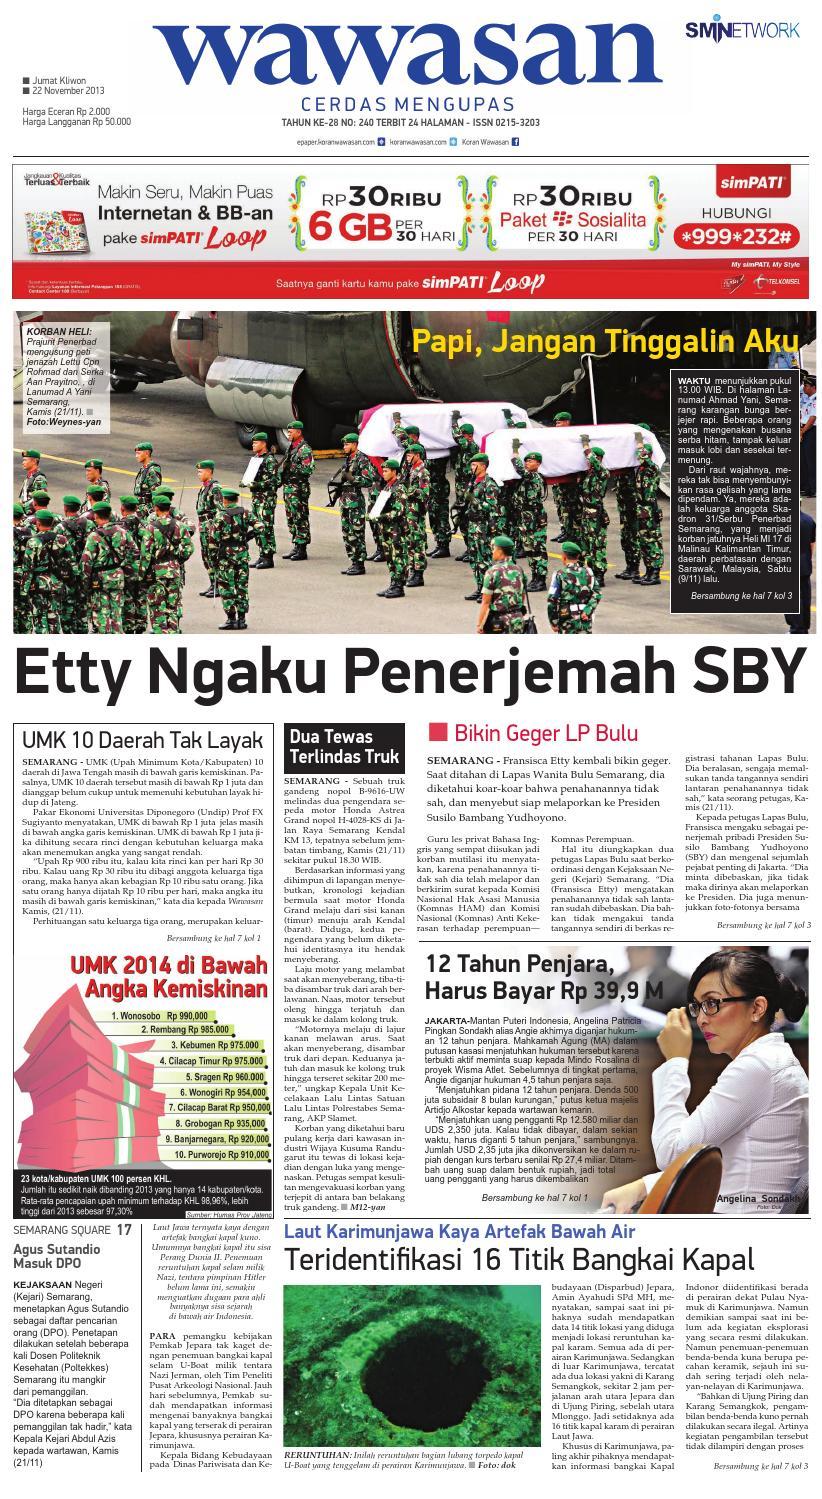 Wawasan 22 Nopember 2013 By Koran Pagi Issuu Tcash Vaganza 36 Produk Ukm Bumn Batik Print Motif3